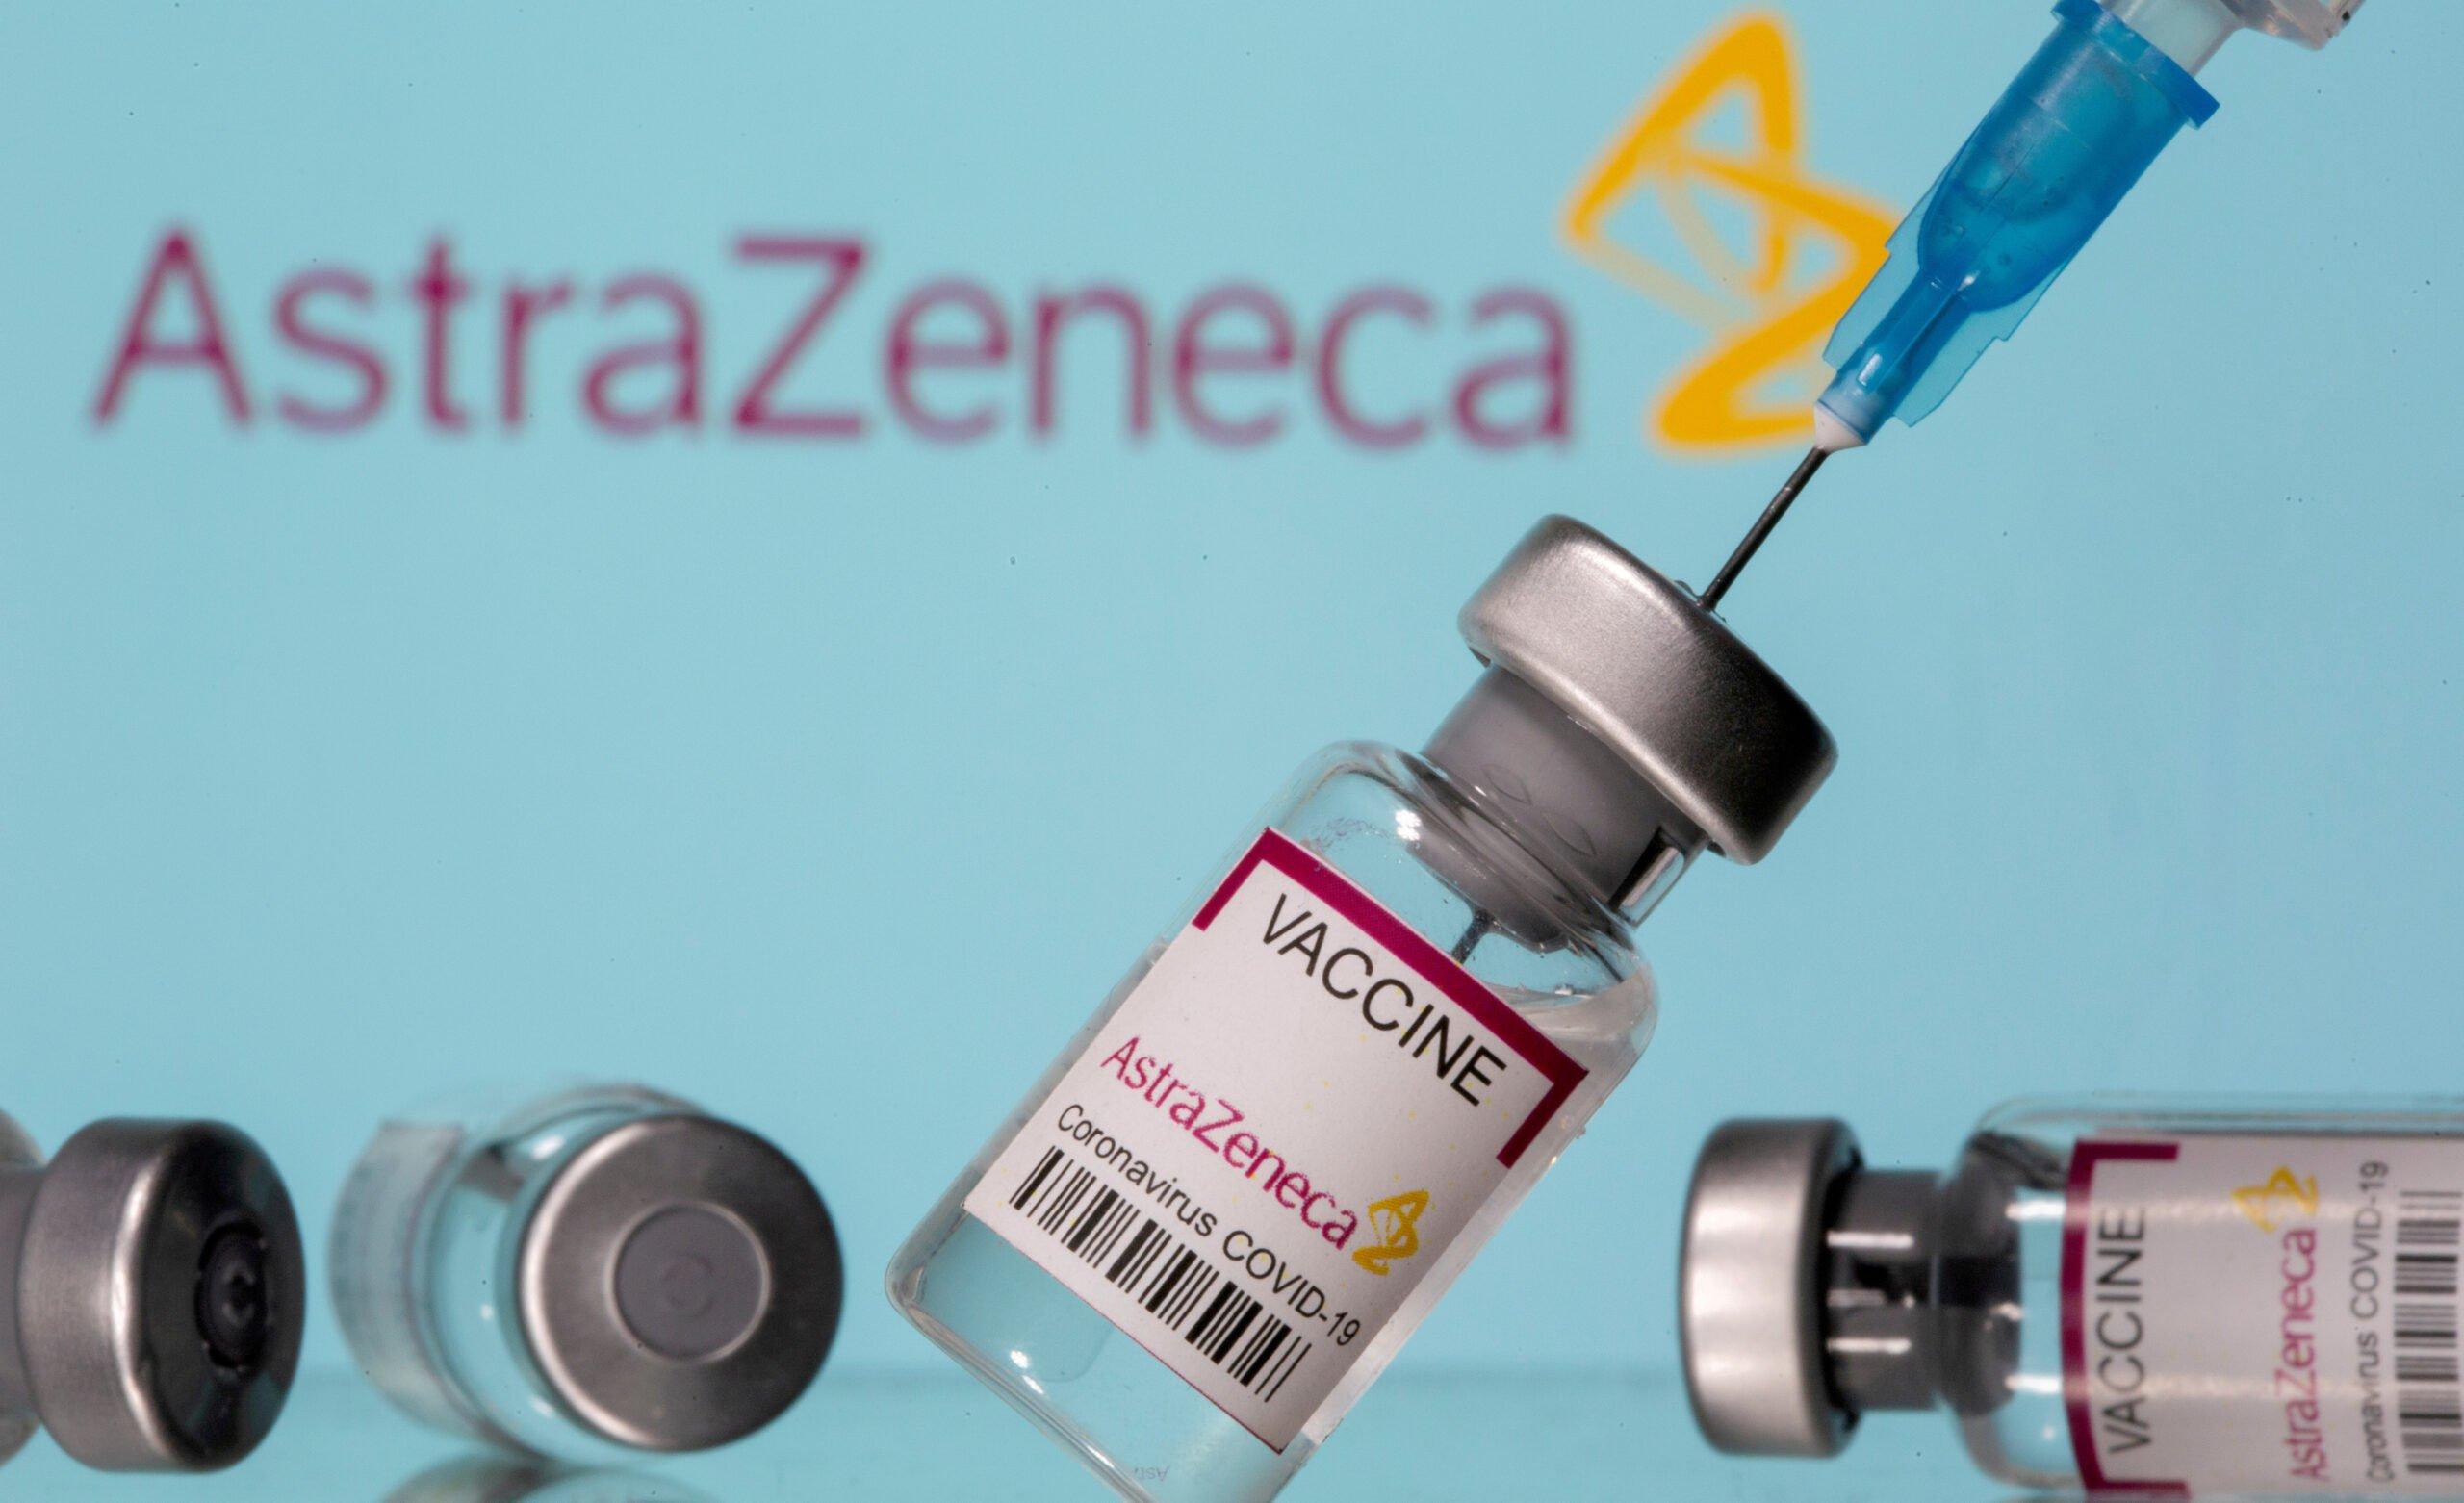 Coronavirus: Μόνο το 10% των ραντεβού εμβολίων για AZ